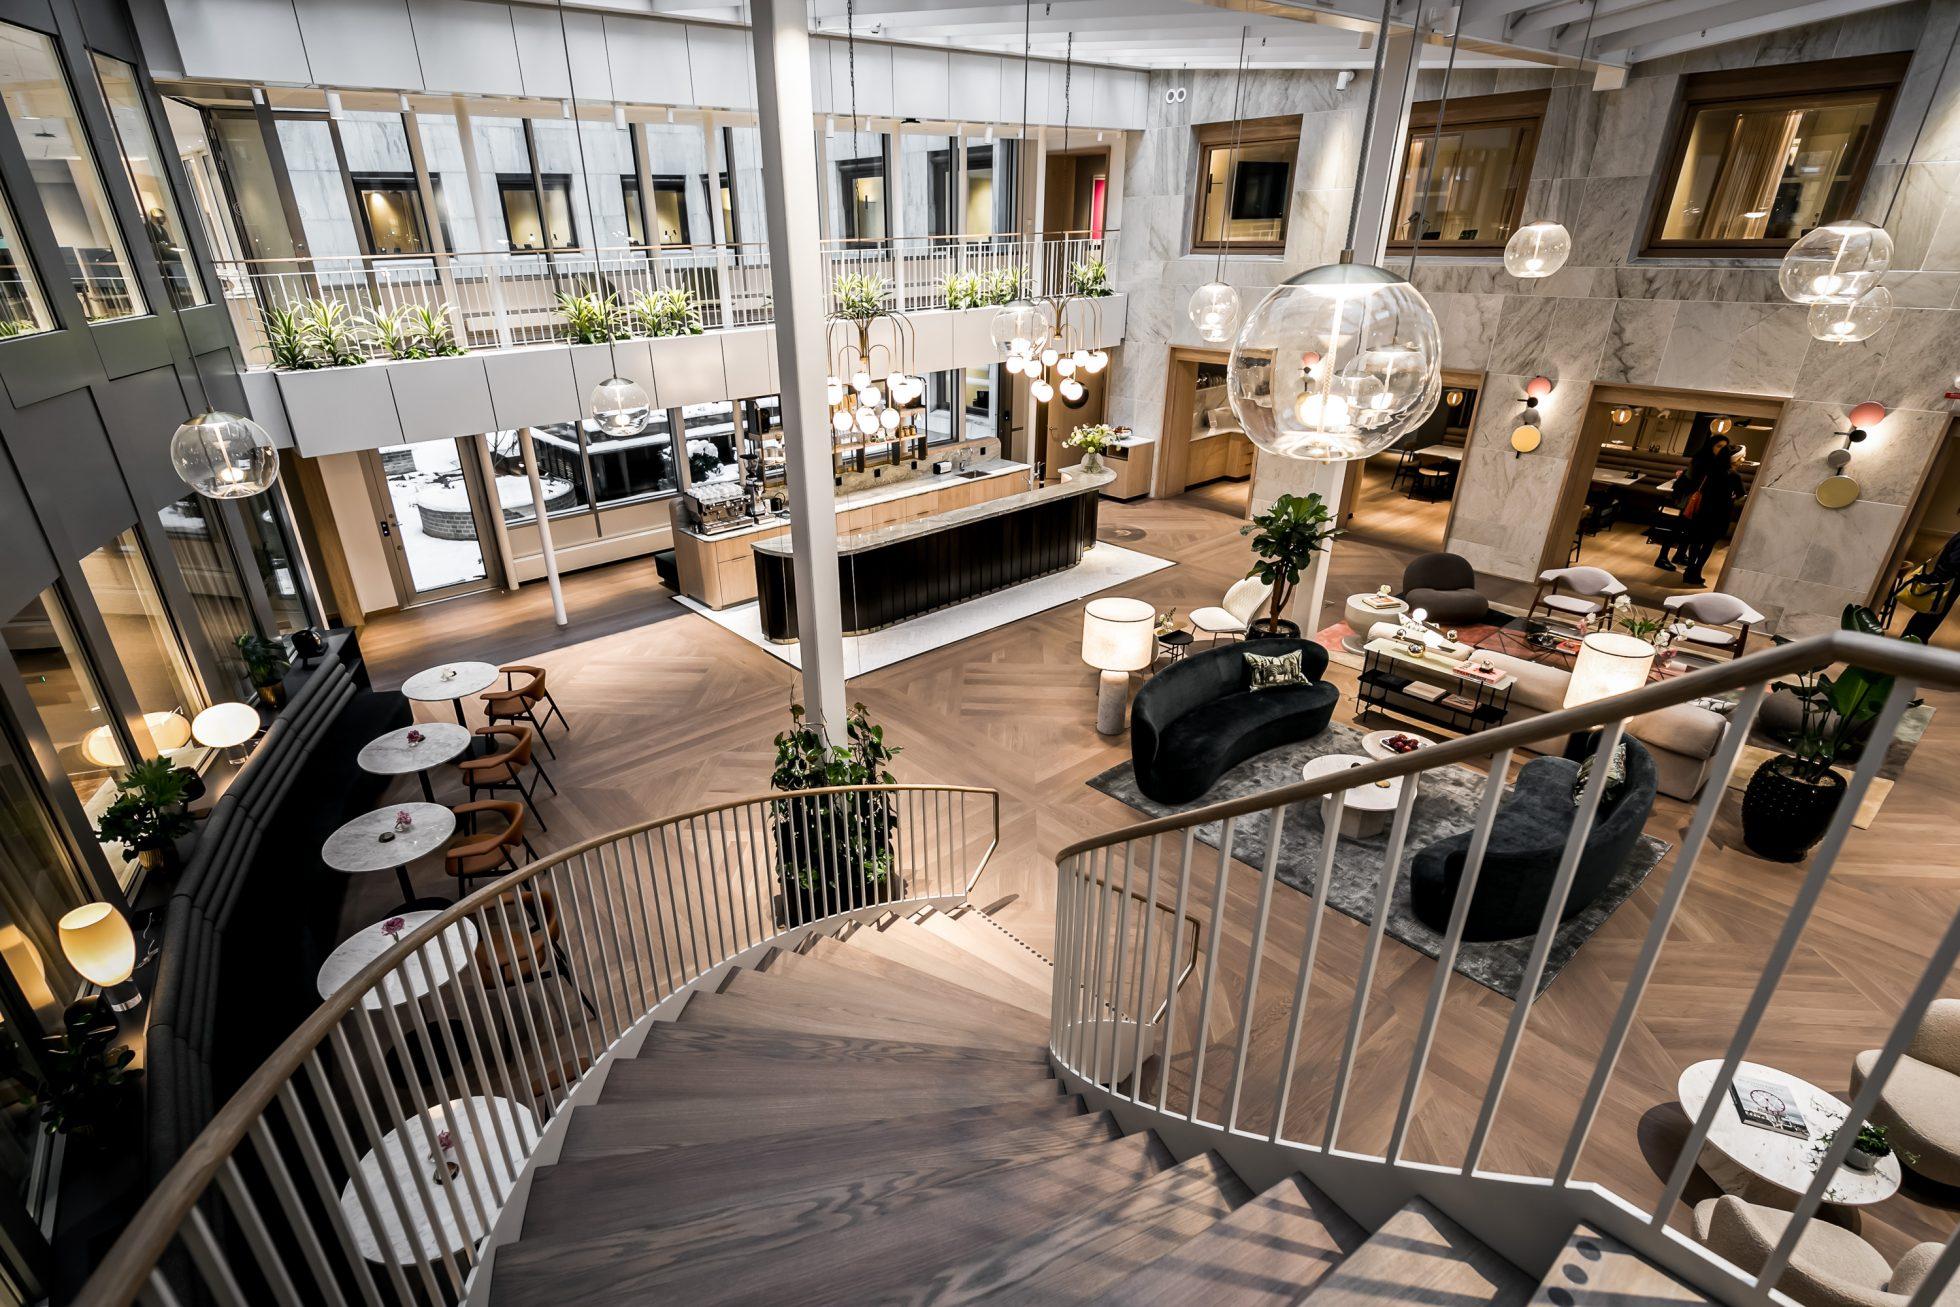 Spana in det nya kontorshotellet i Bibliotekstan